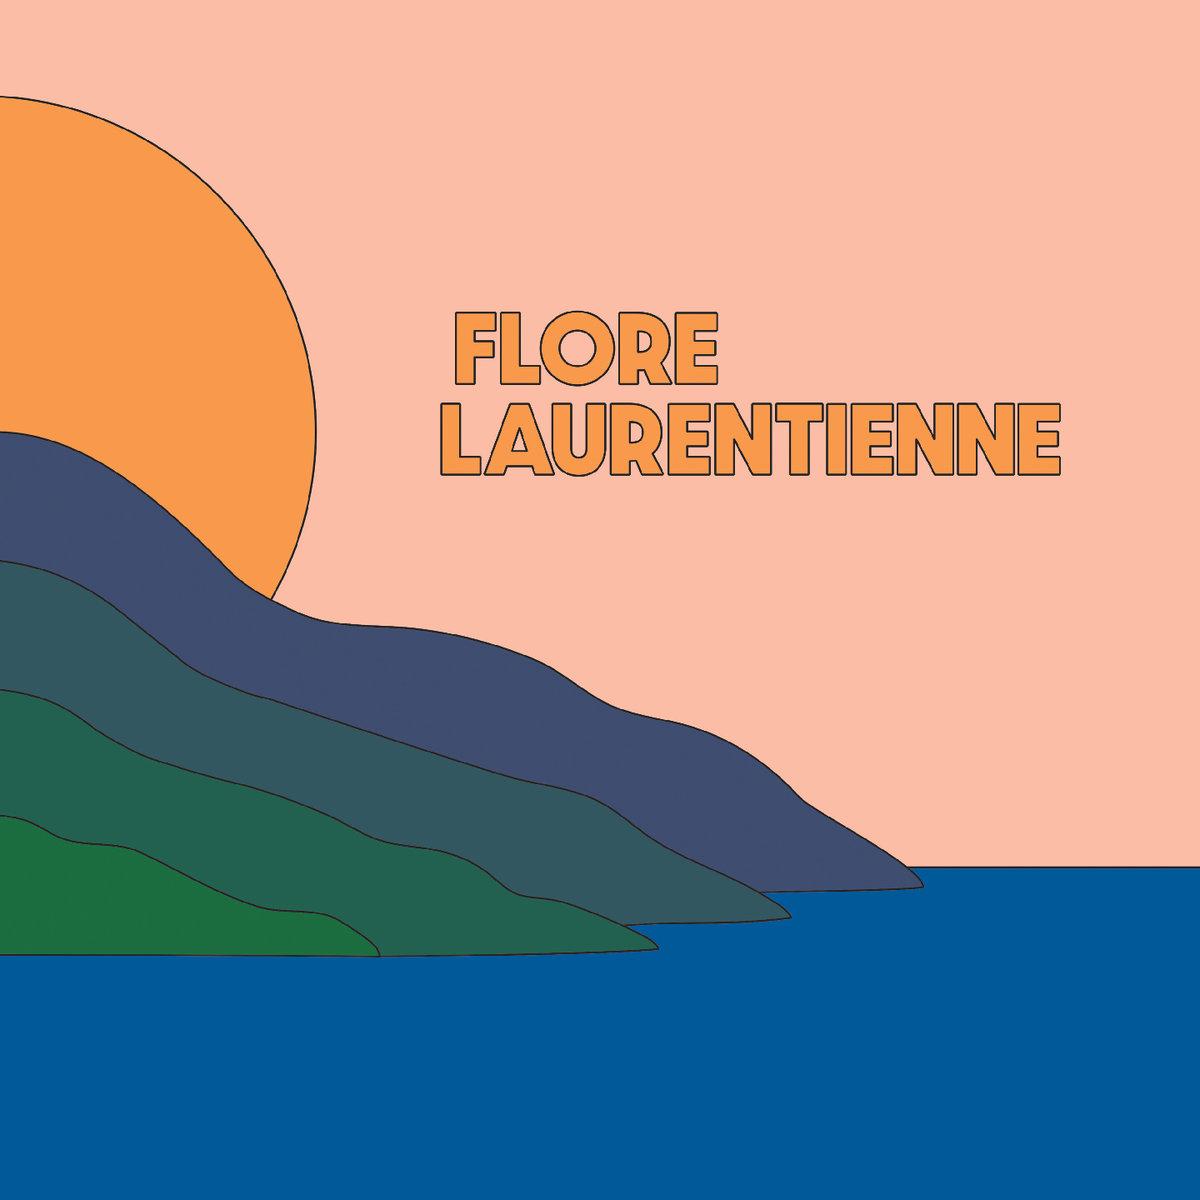 flore laurentienne volume 1